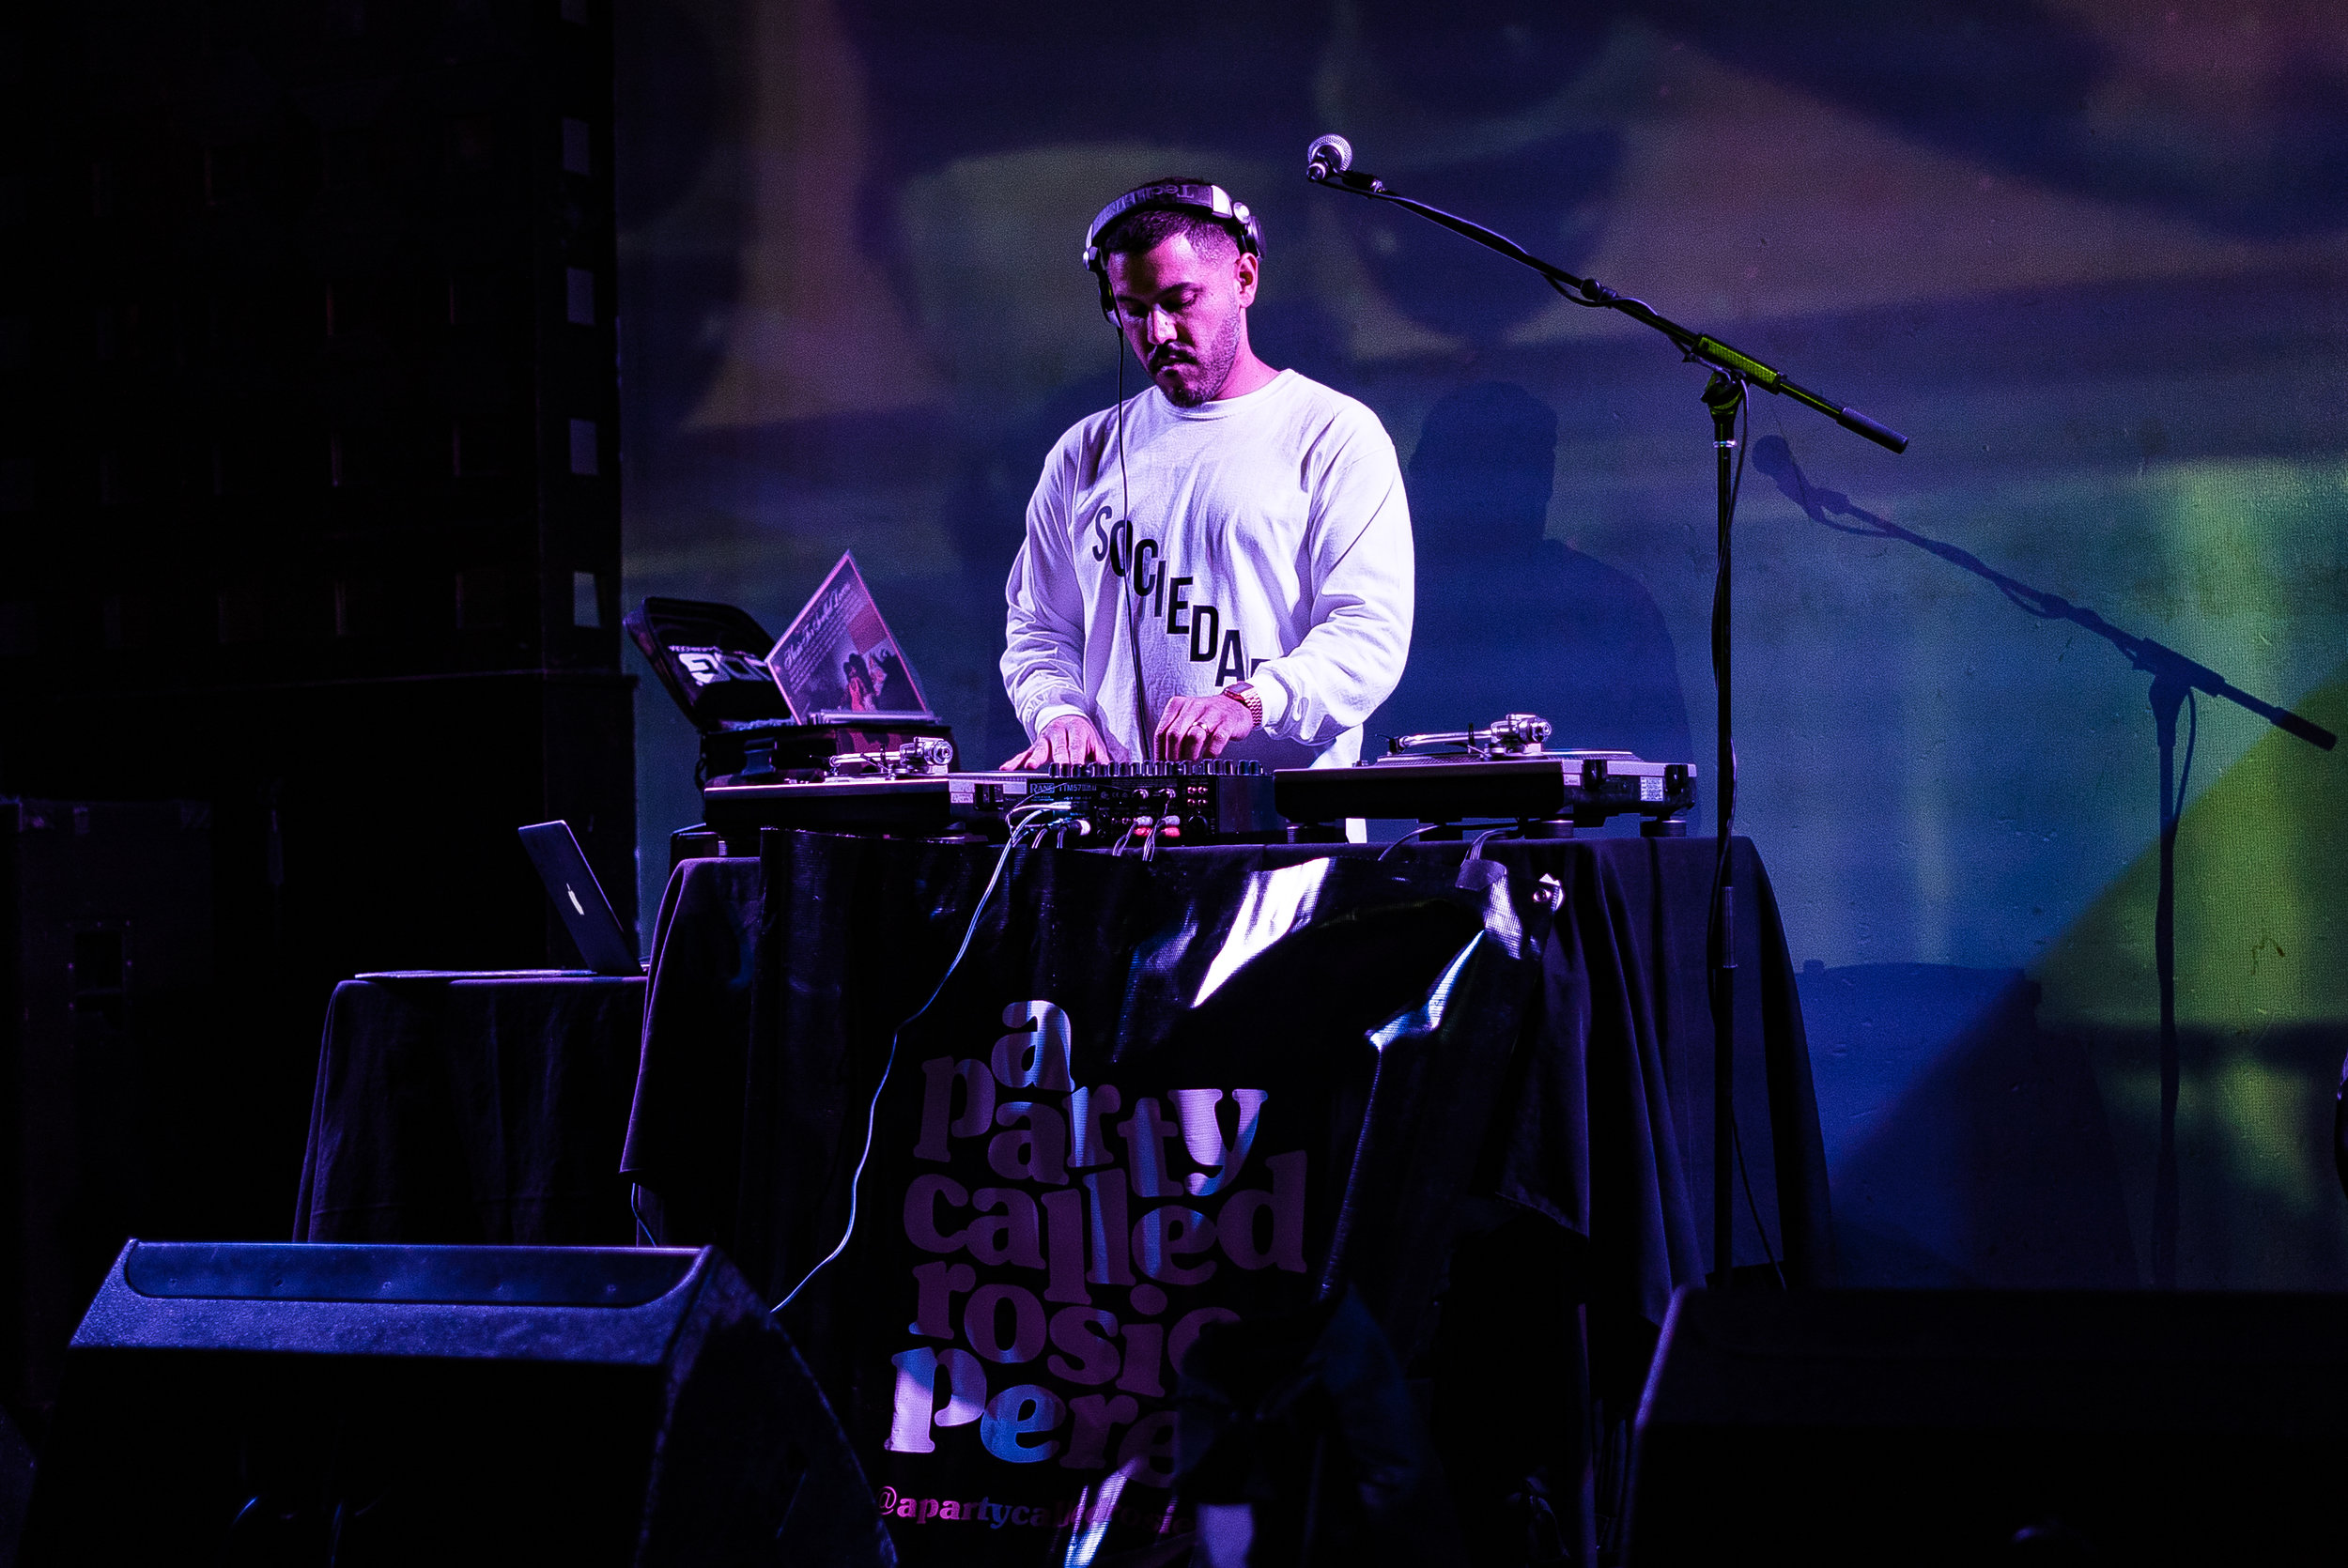 DJ 130-2017 A Party Called Rosie Perez Pa Puerto Rico_0005.jpg